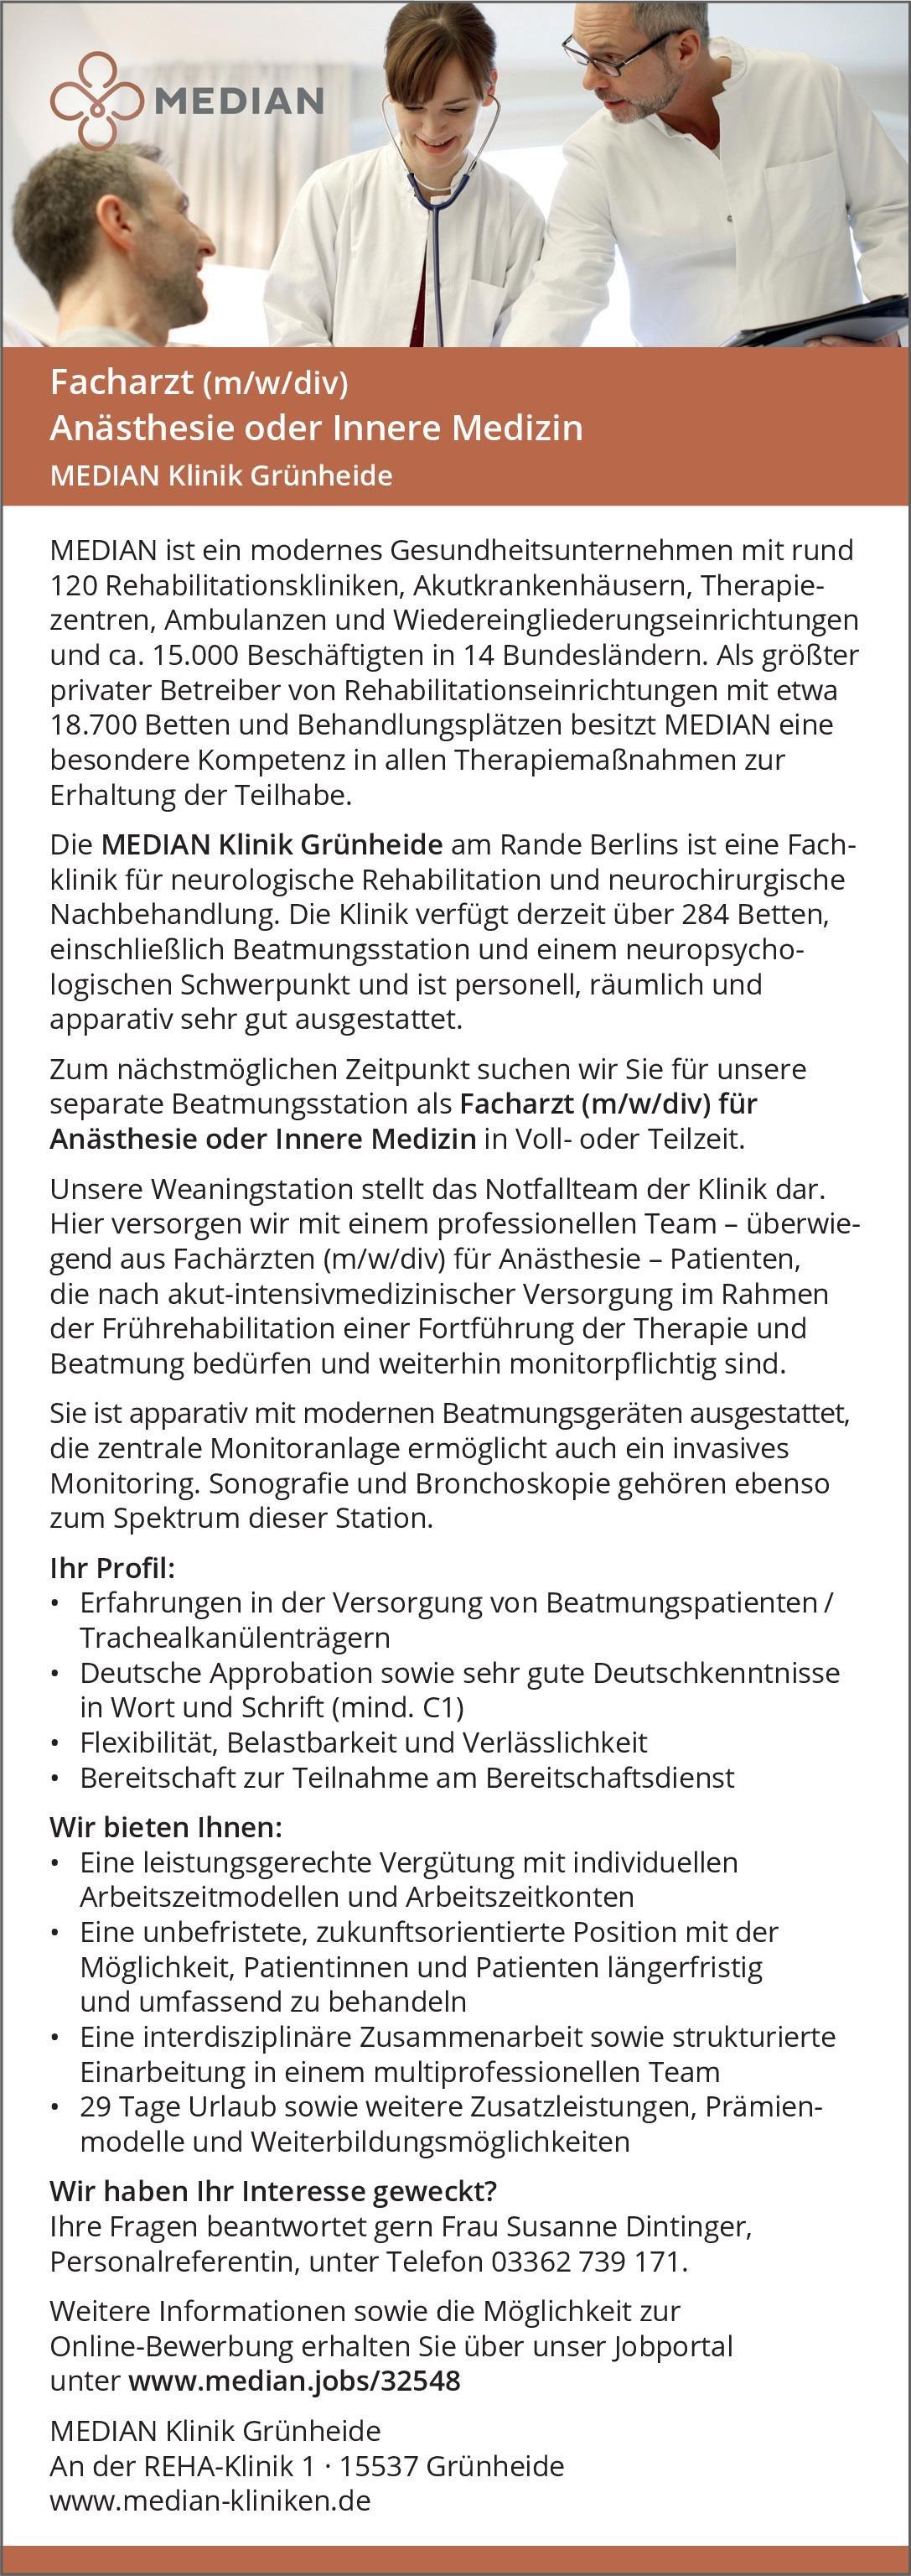 MEDIAN Klinik Grünheide Facharzt (m/w/div) Anästhesie oder Innere Medizin  Innere Medizin, Anästhesiologie / Intensivmedizin, Innere Medizin Arzt / Facharzt